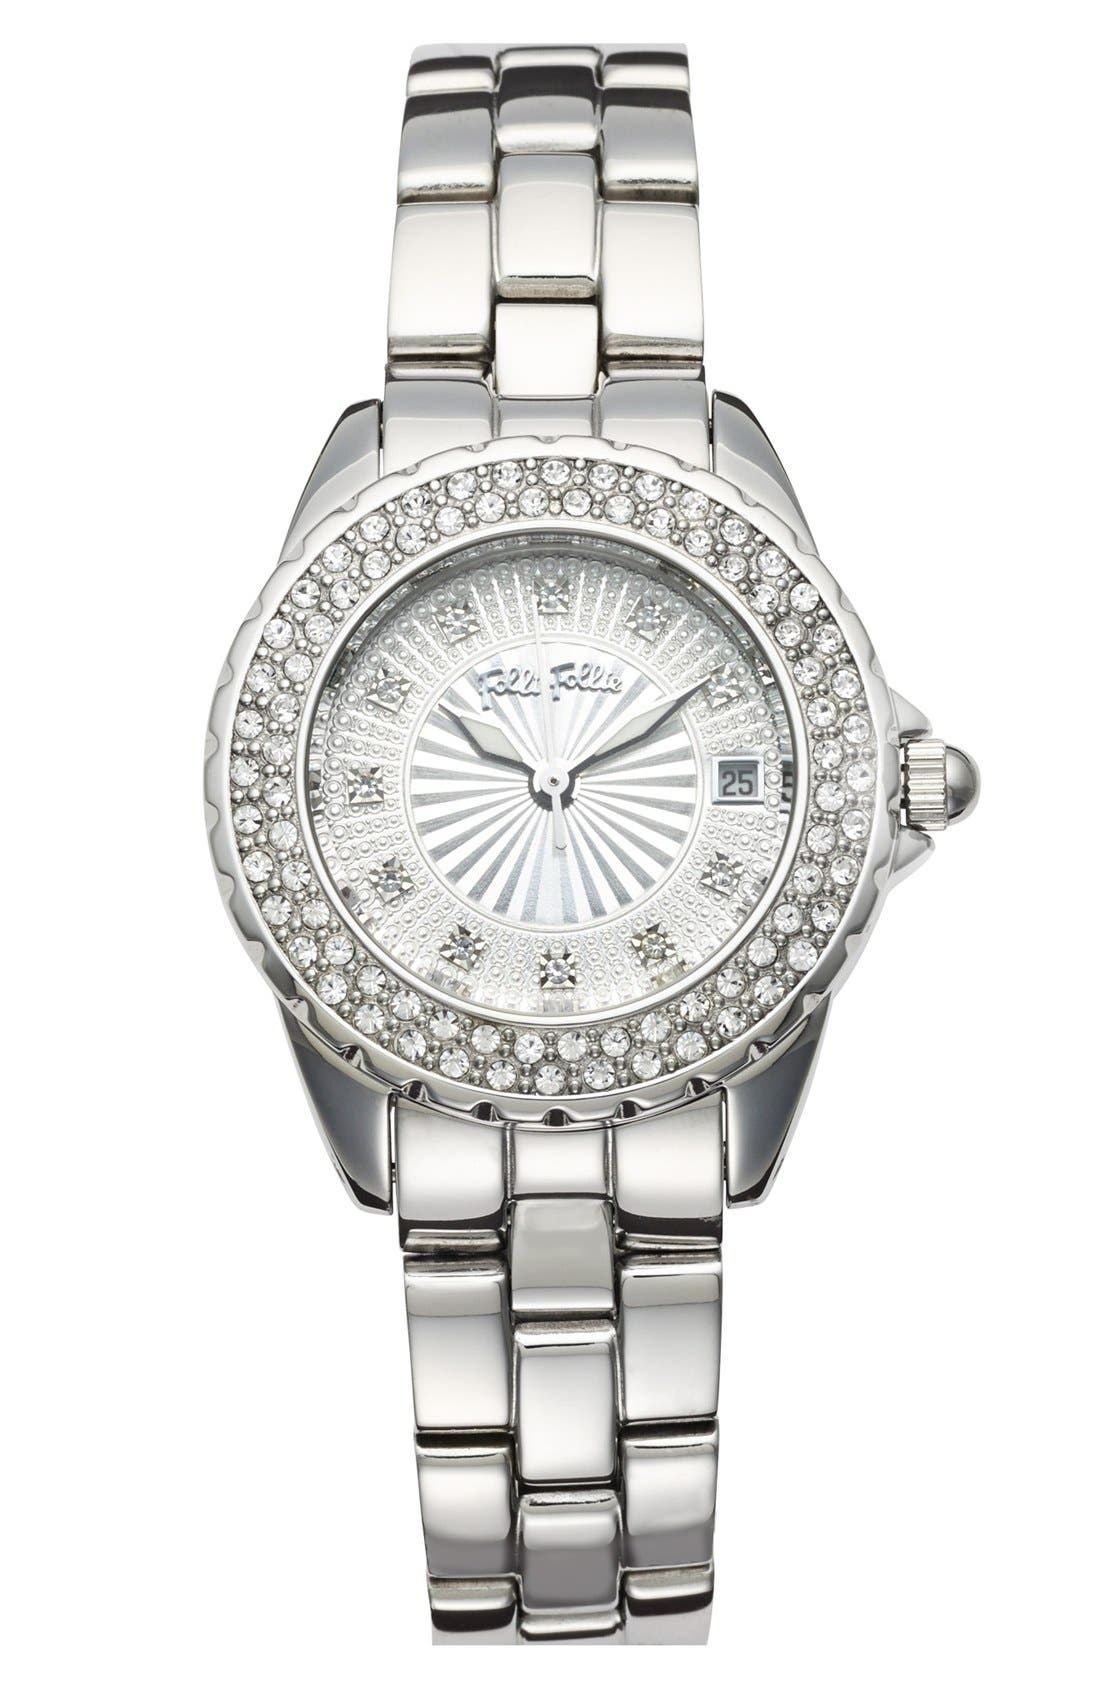 Main Image - Folli Follie 'Daydream' Crystal Bezel Bracelet Watch, 29mm